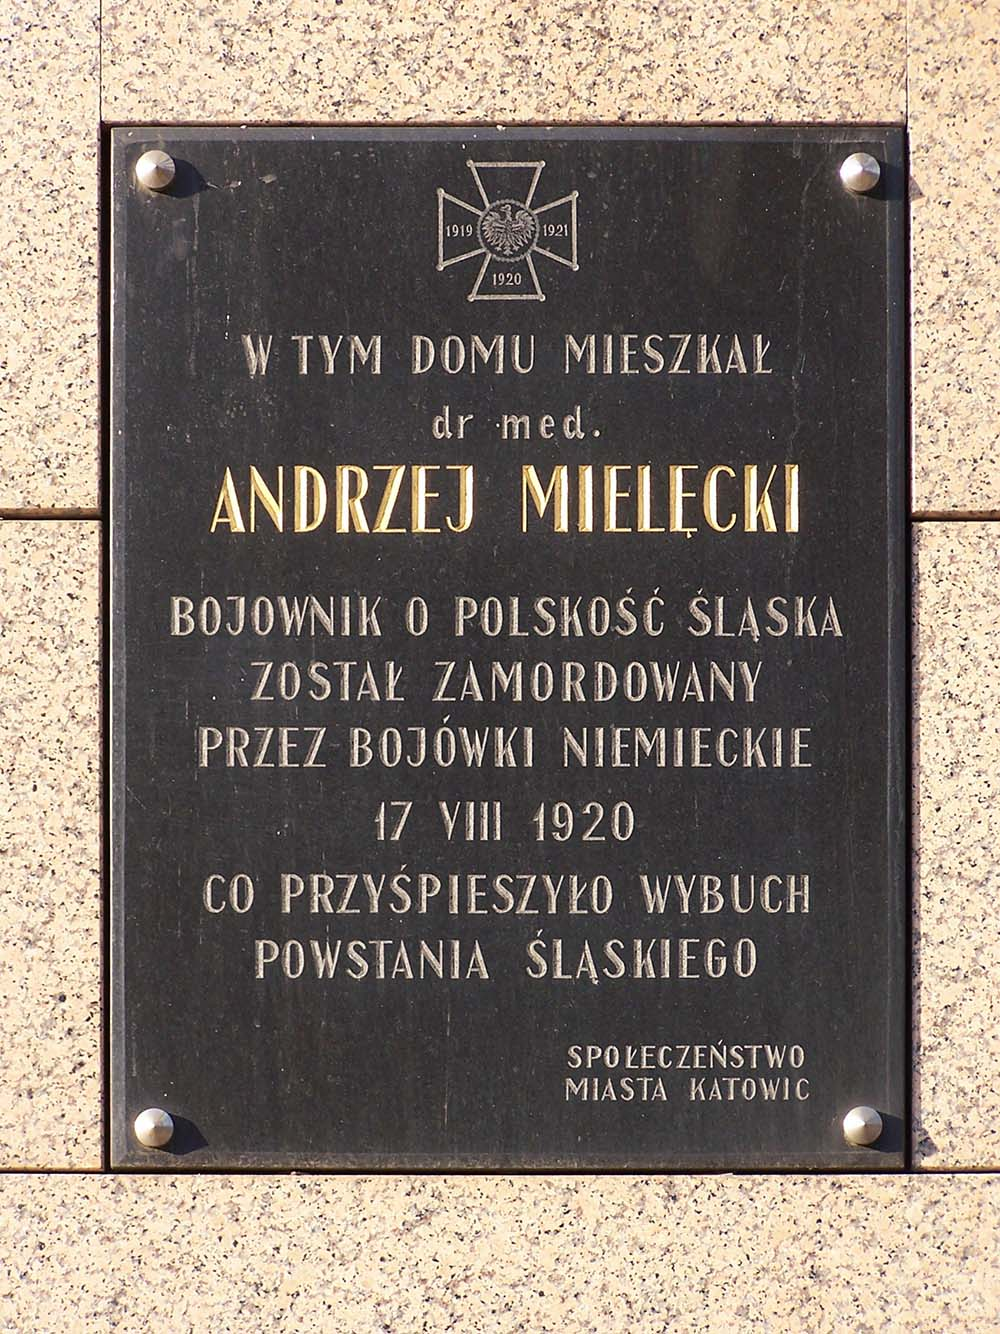 Andrzej Mielecki Plaque